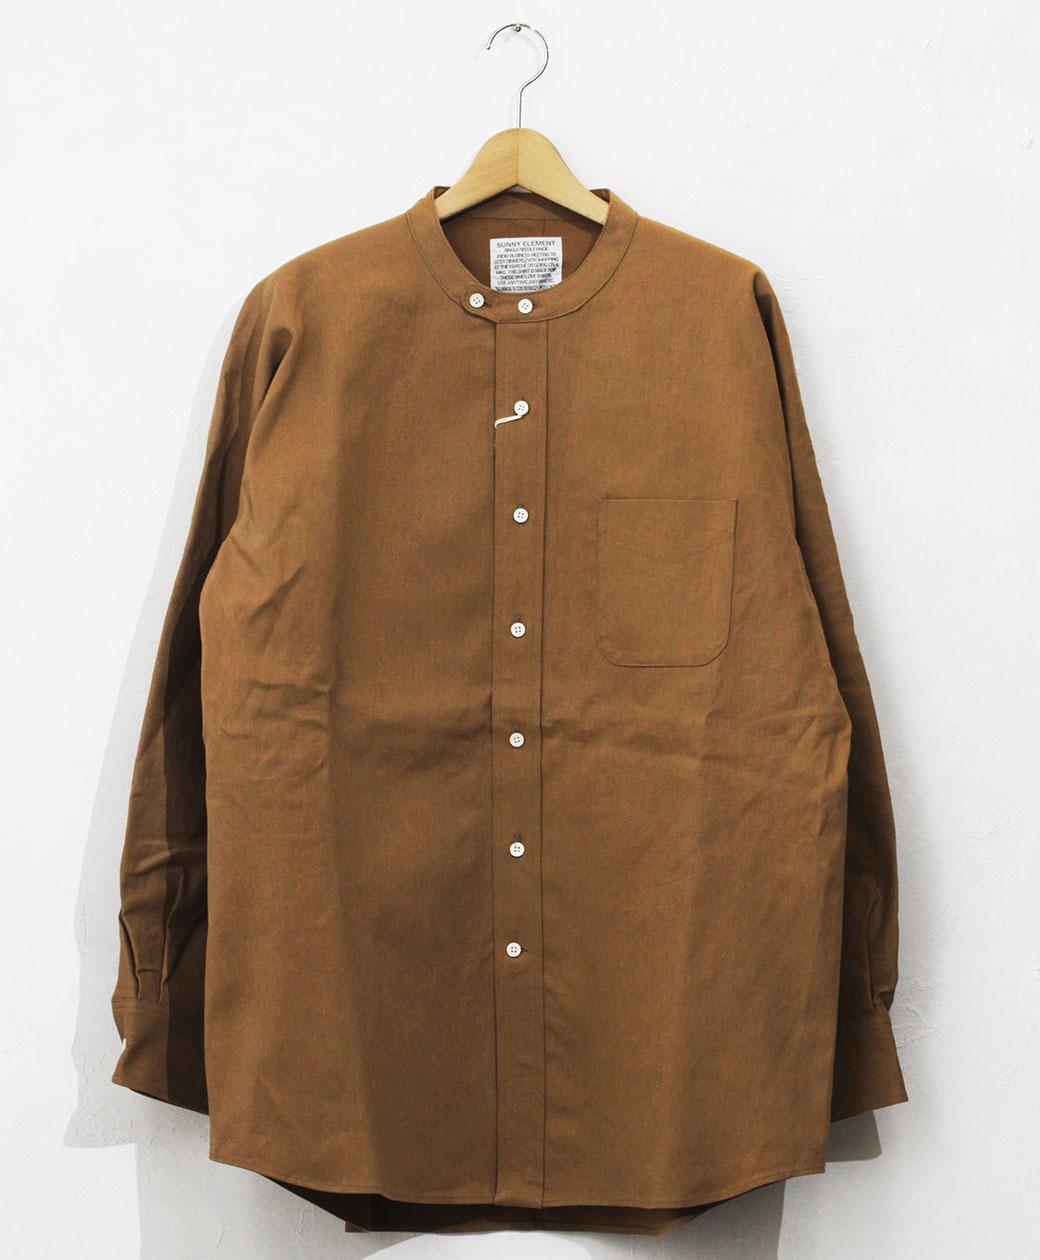 SUNNY ELEMENT Park Shirt(Camel)